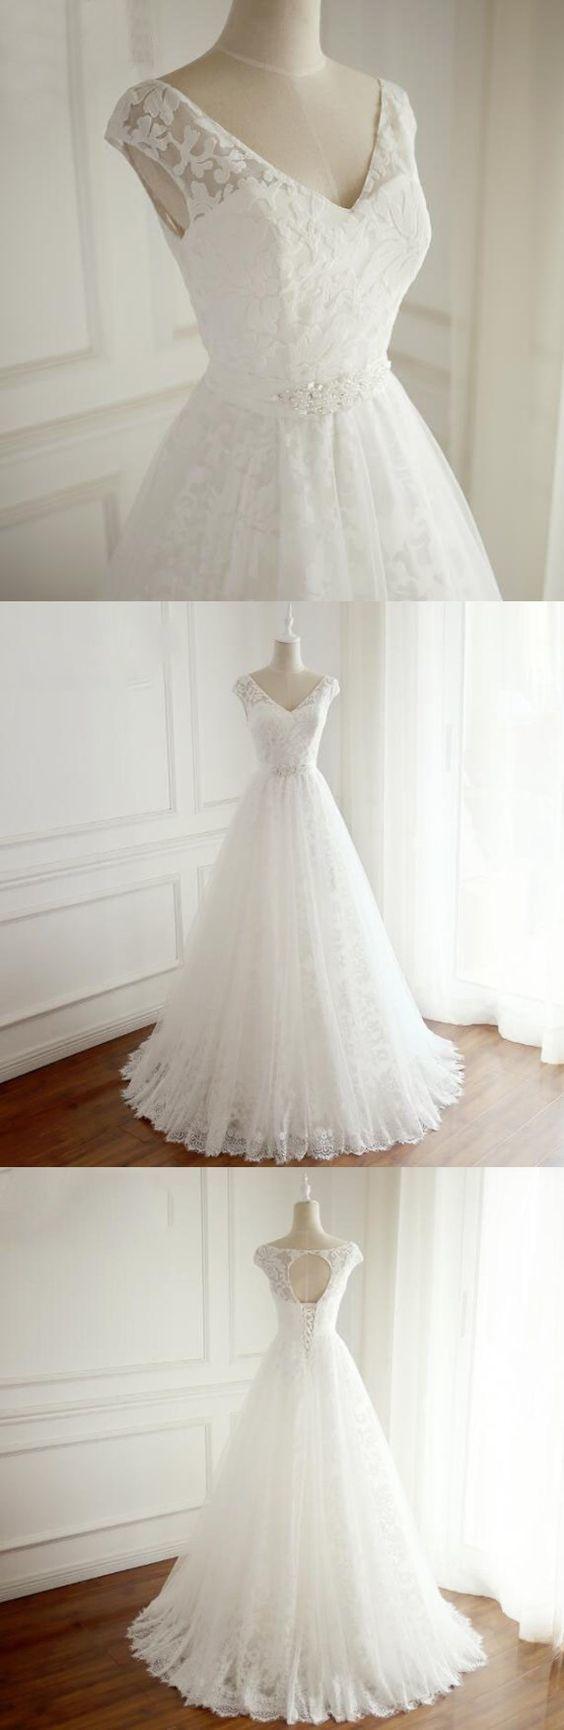 Copy of 2019 A-Line Sweetheart Sleeveless Wedding Dress ,Prom Dress, Simple